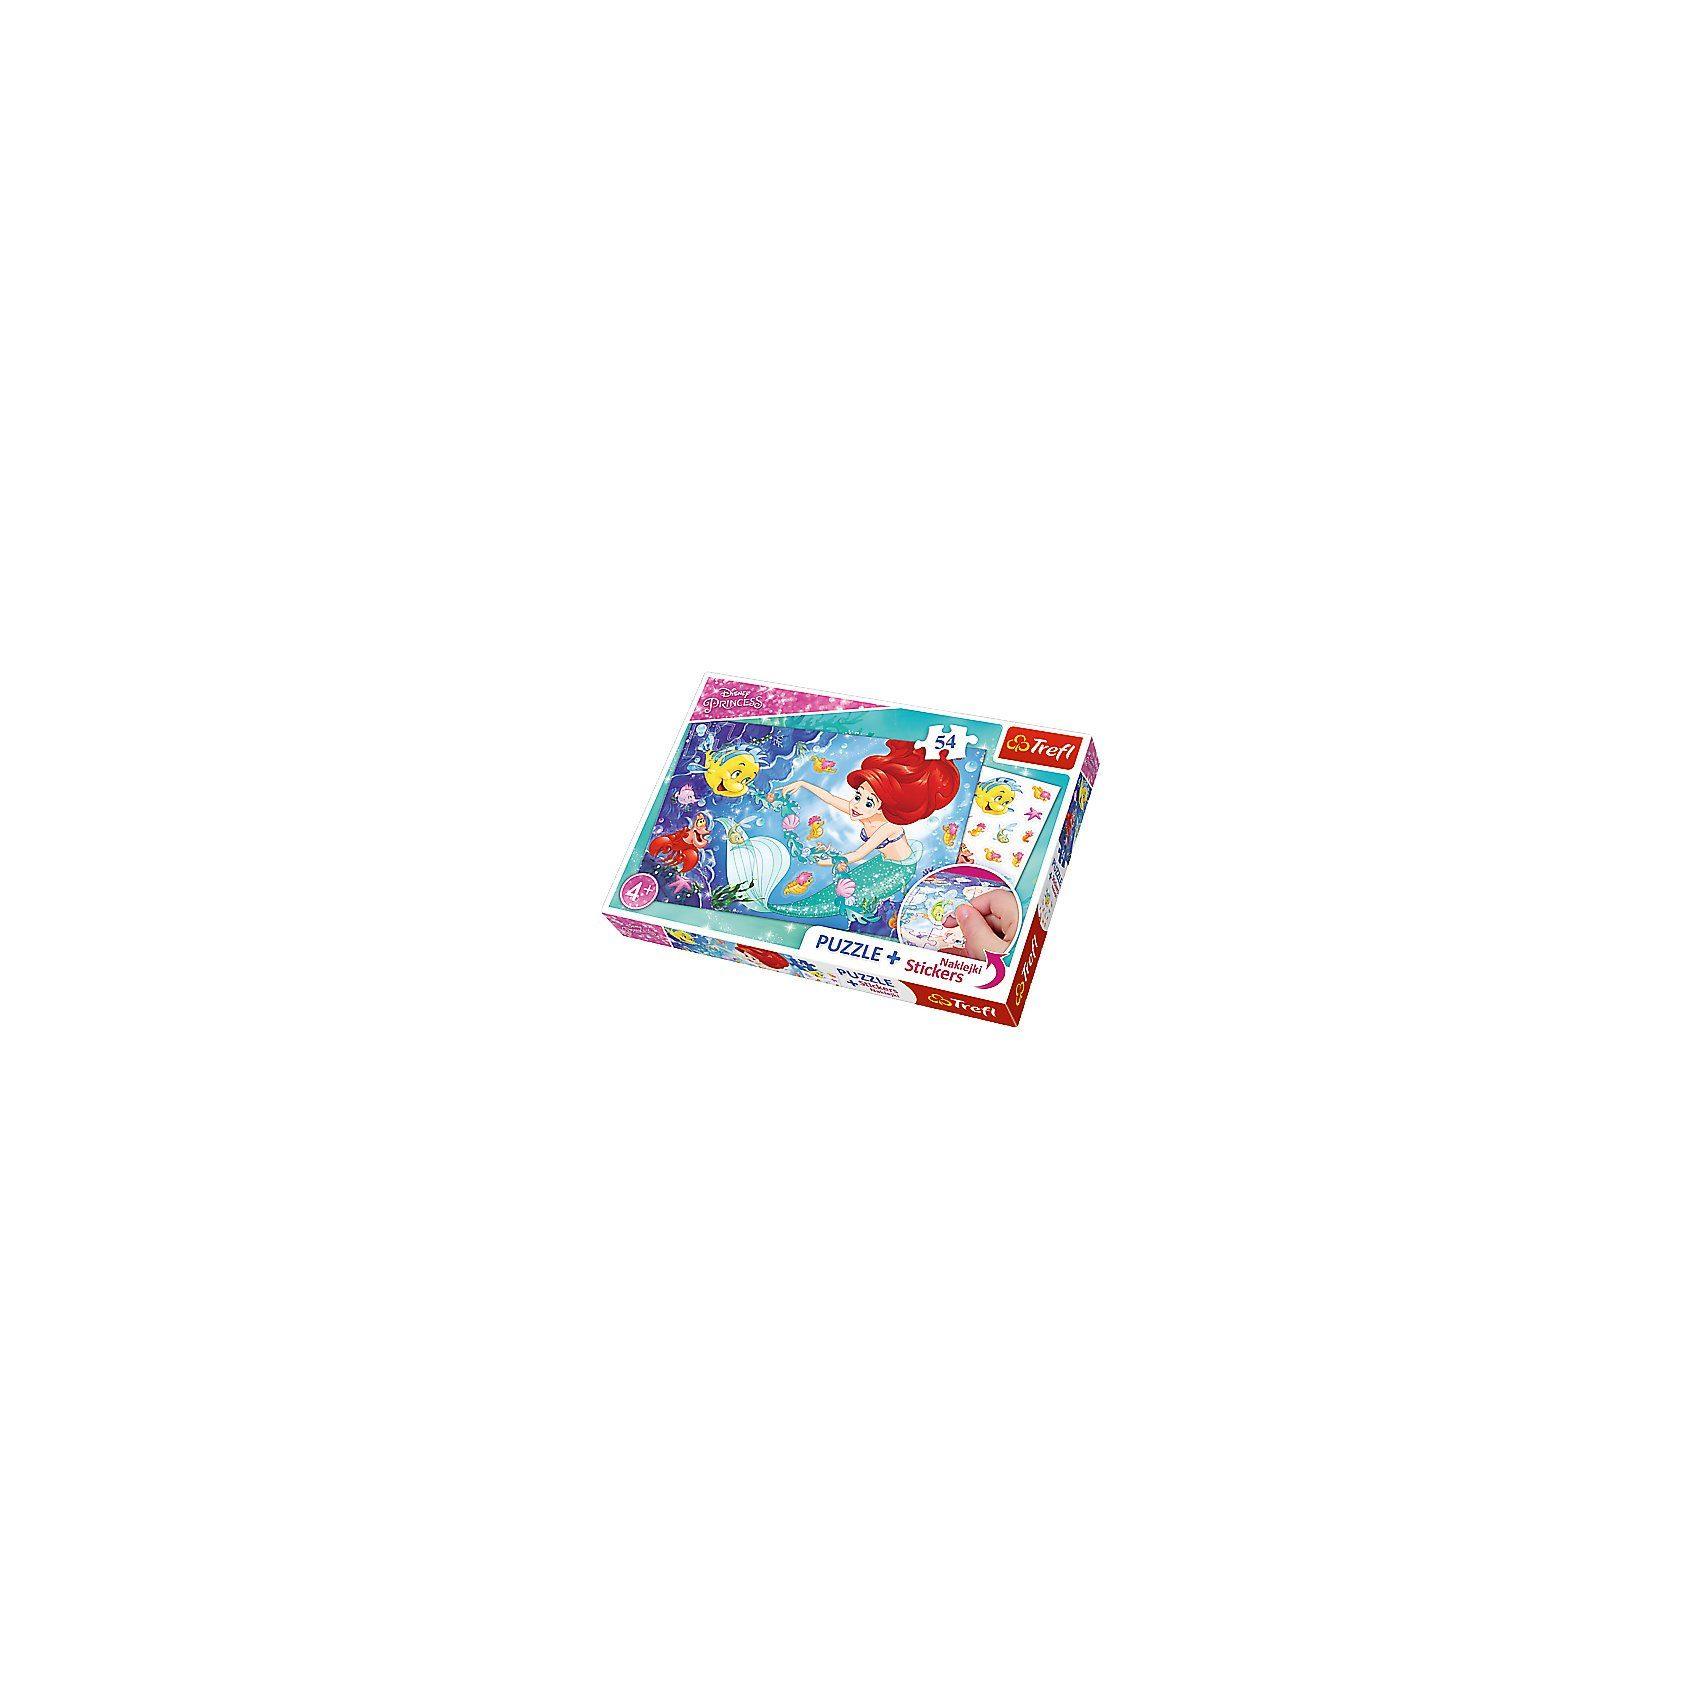 Trefl Puzzle - 54 Teile + Stickers - Arielle